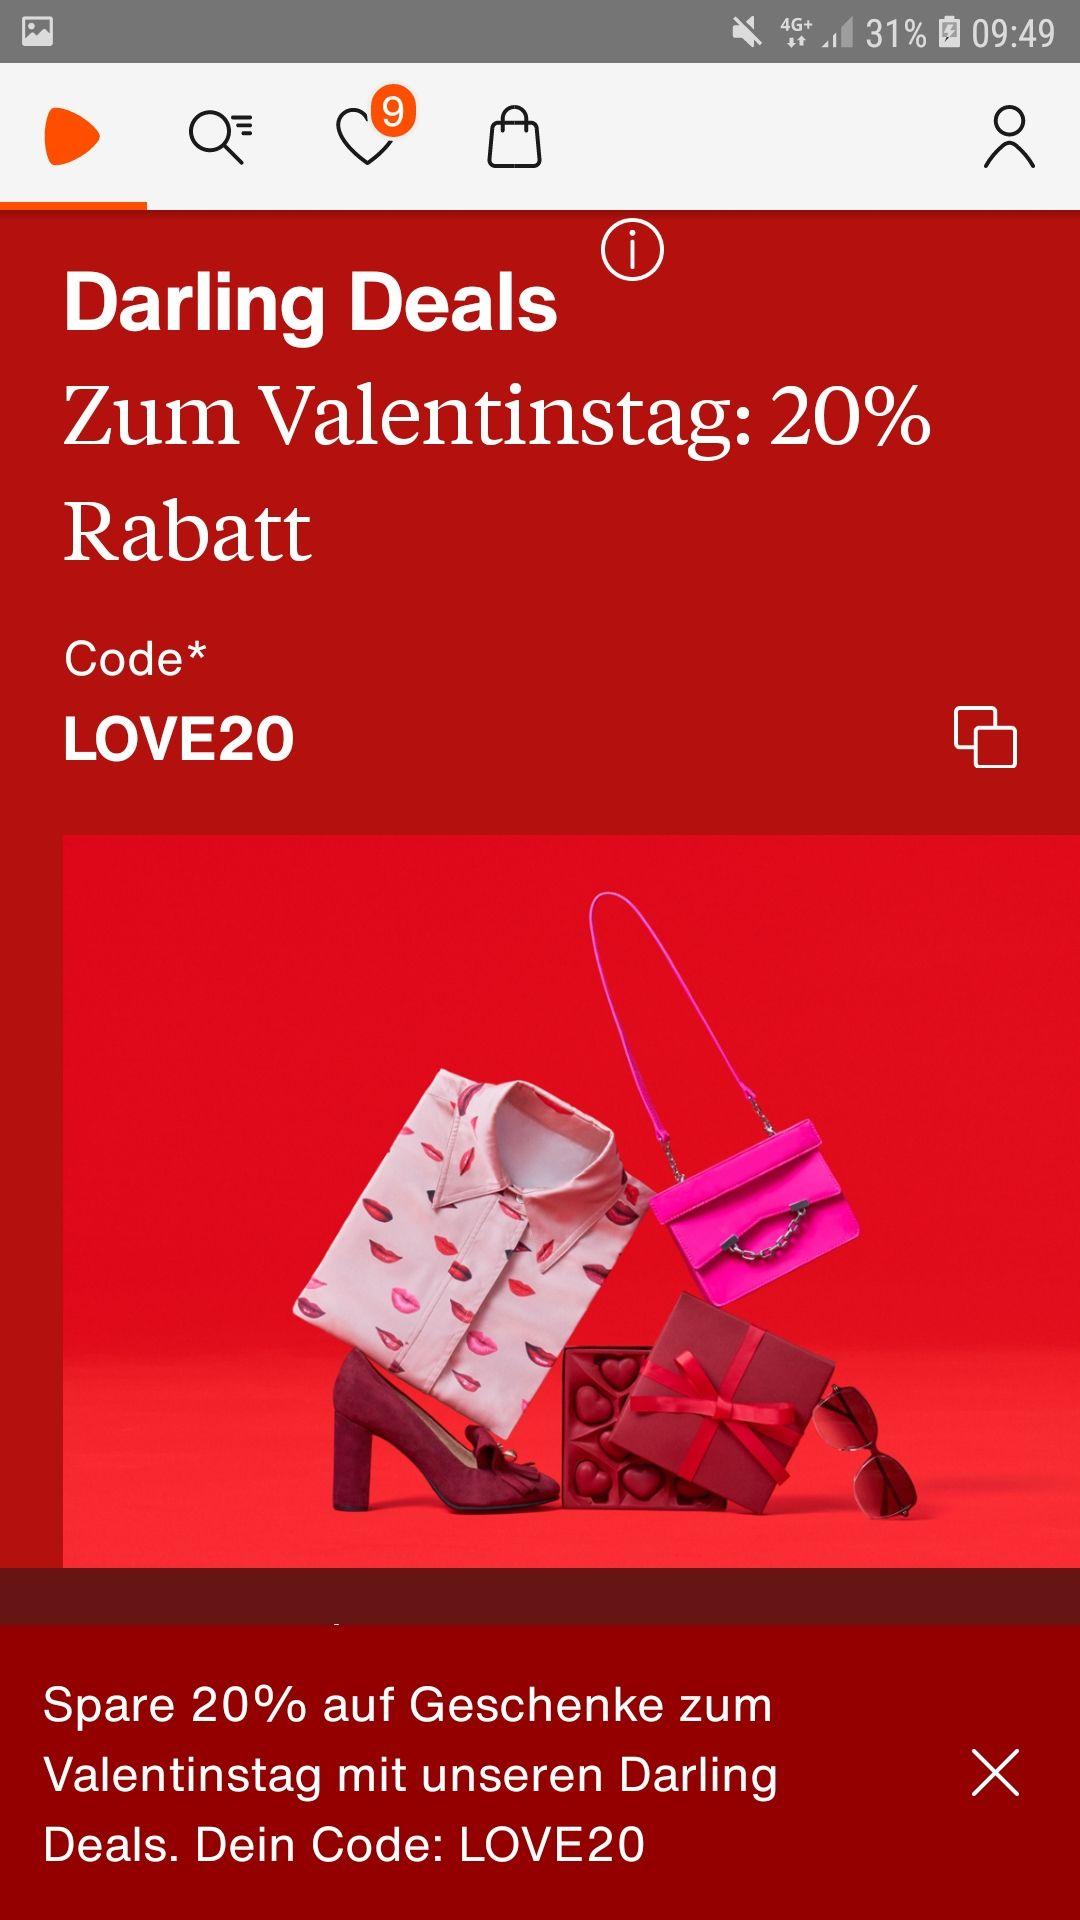 Darling deals Zalando zum Valentinstag